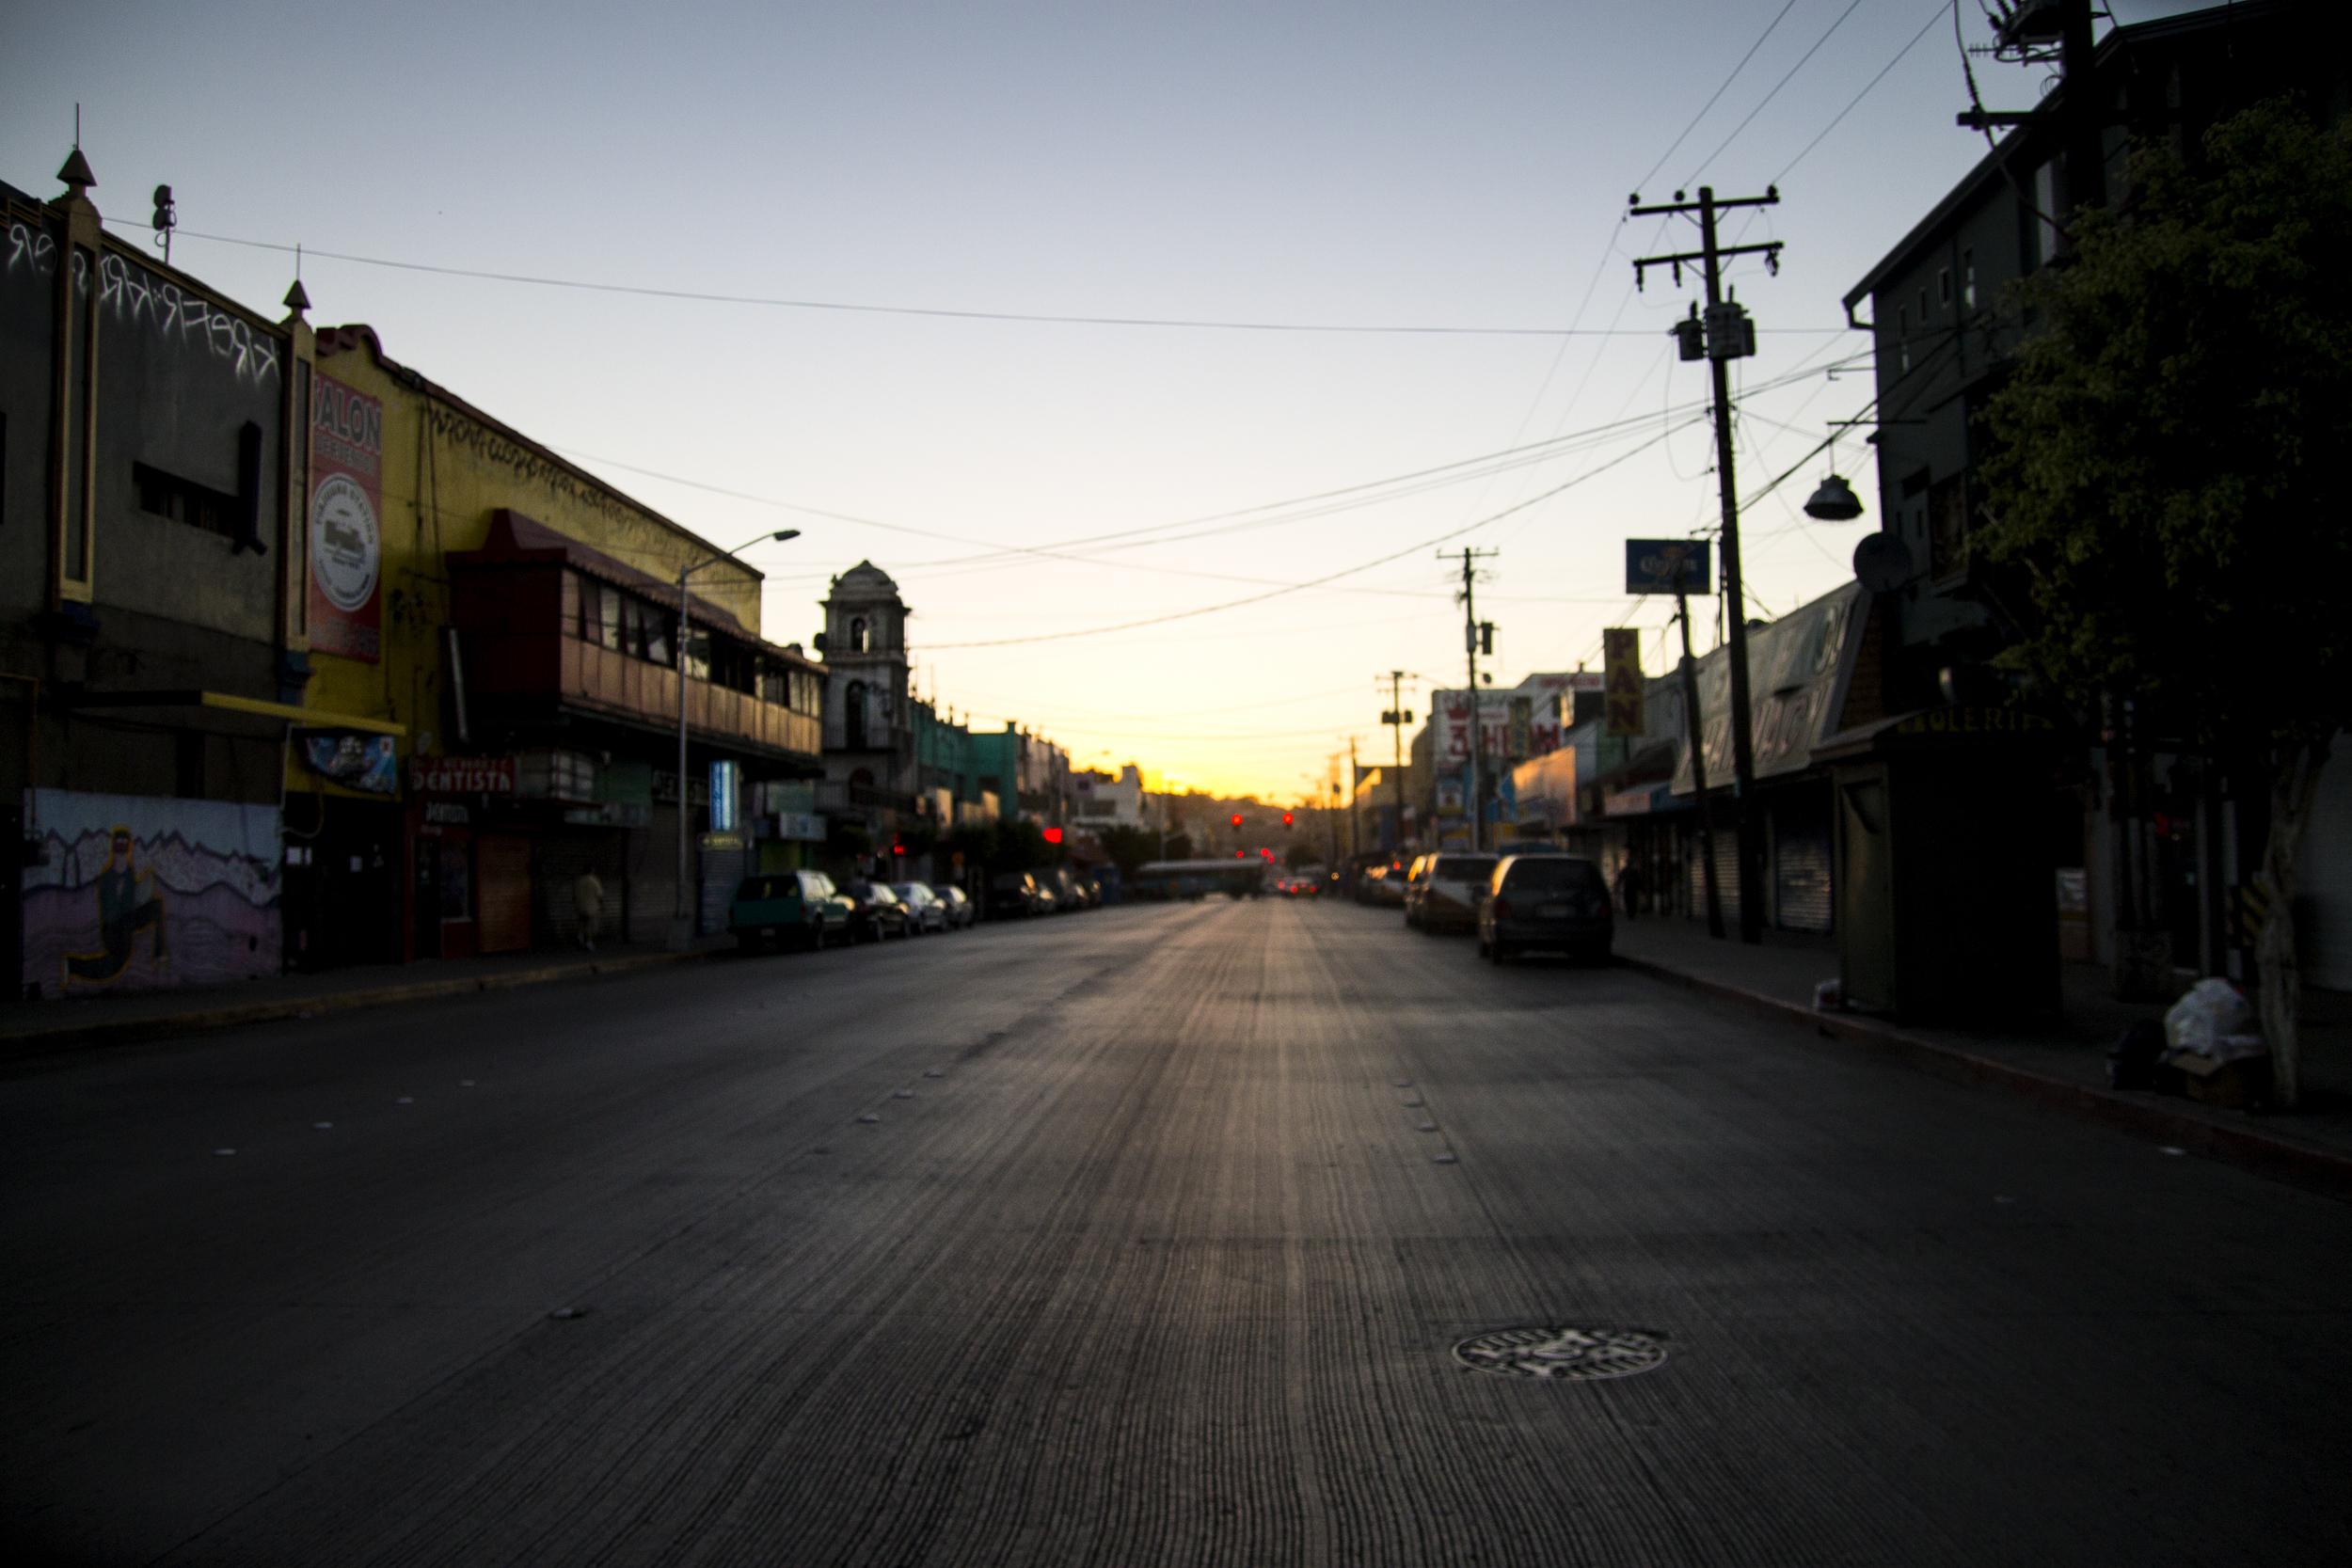 A street in Tijuana